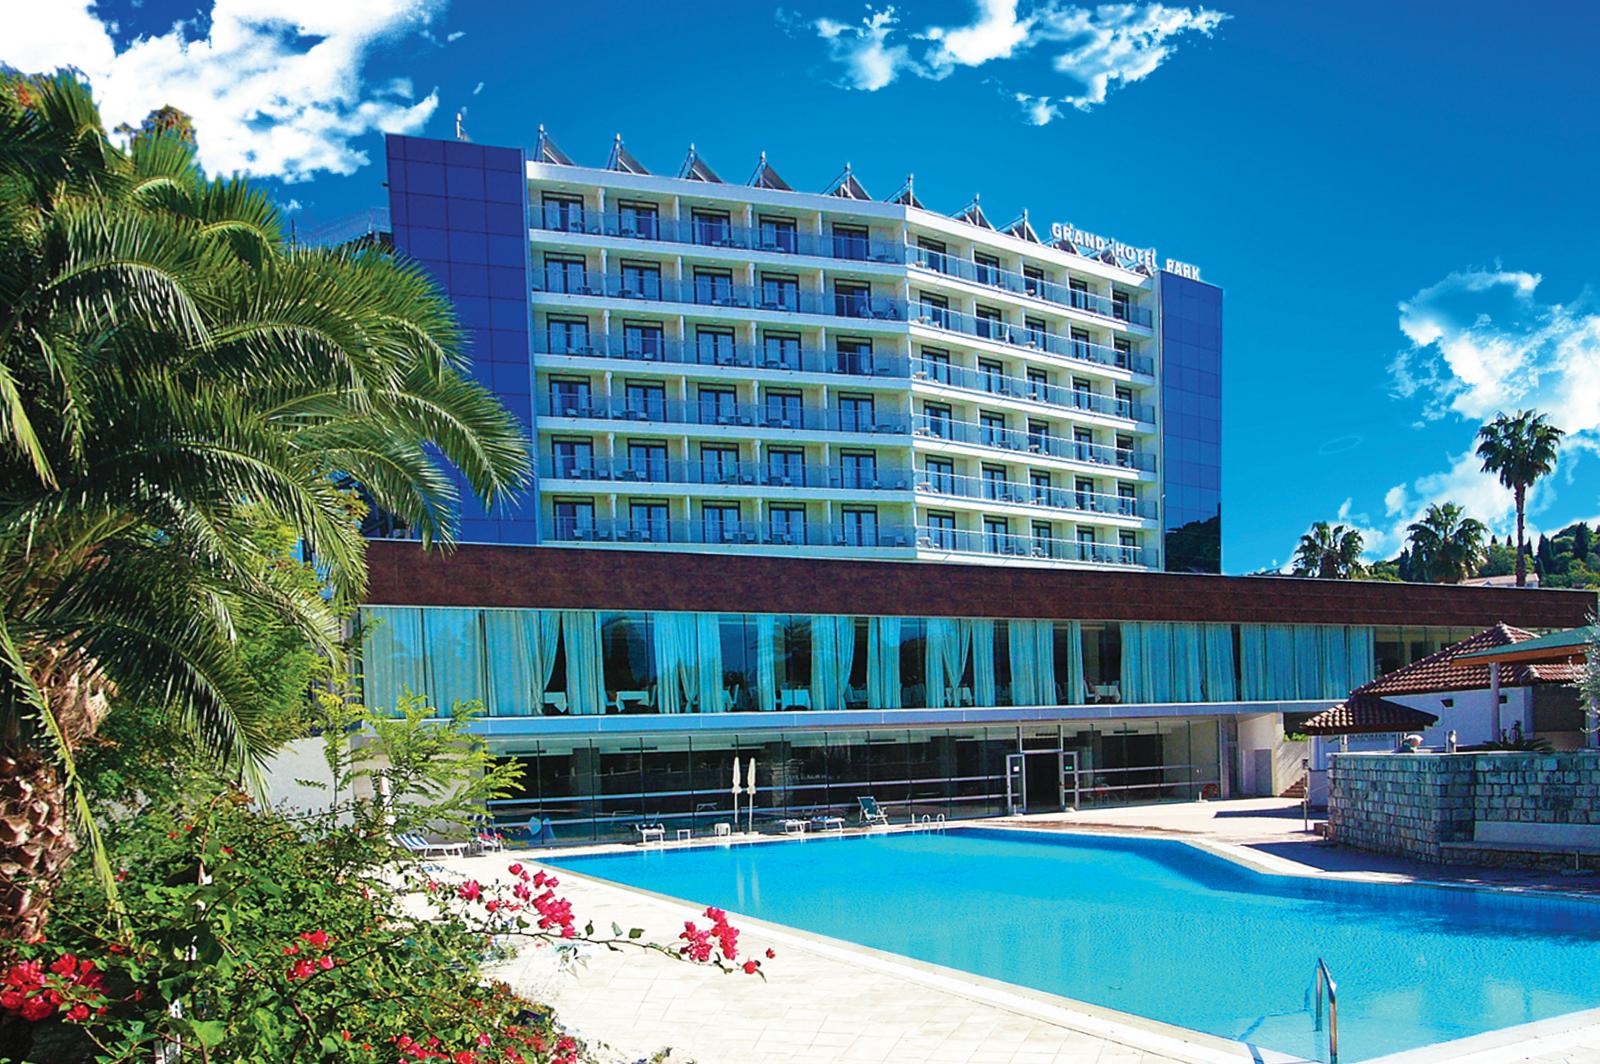 Grand Hotel Park #2